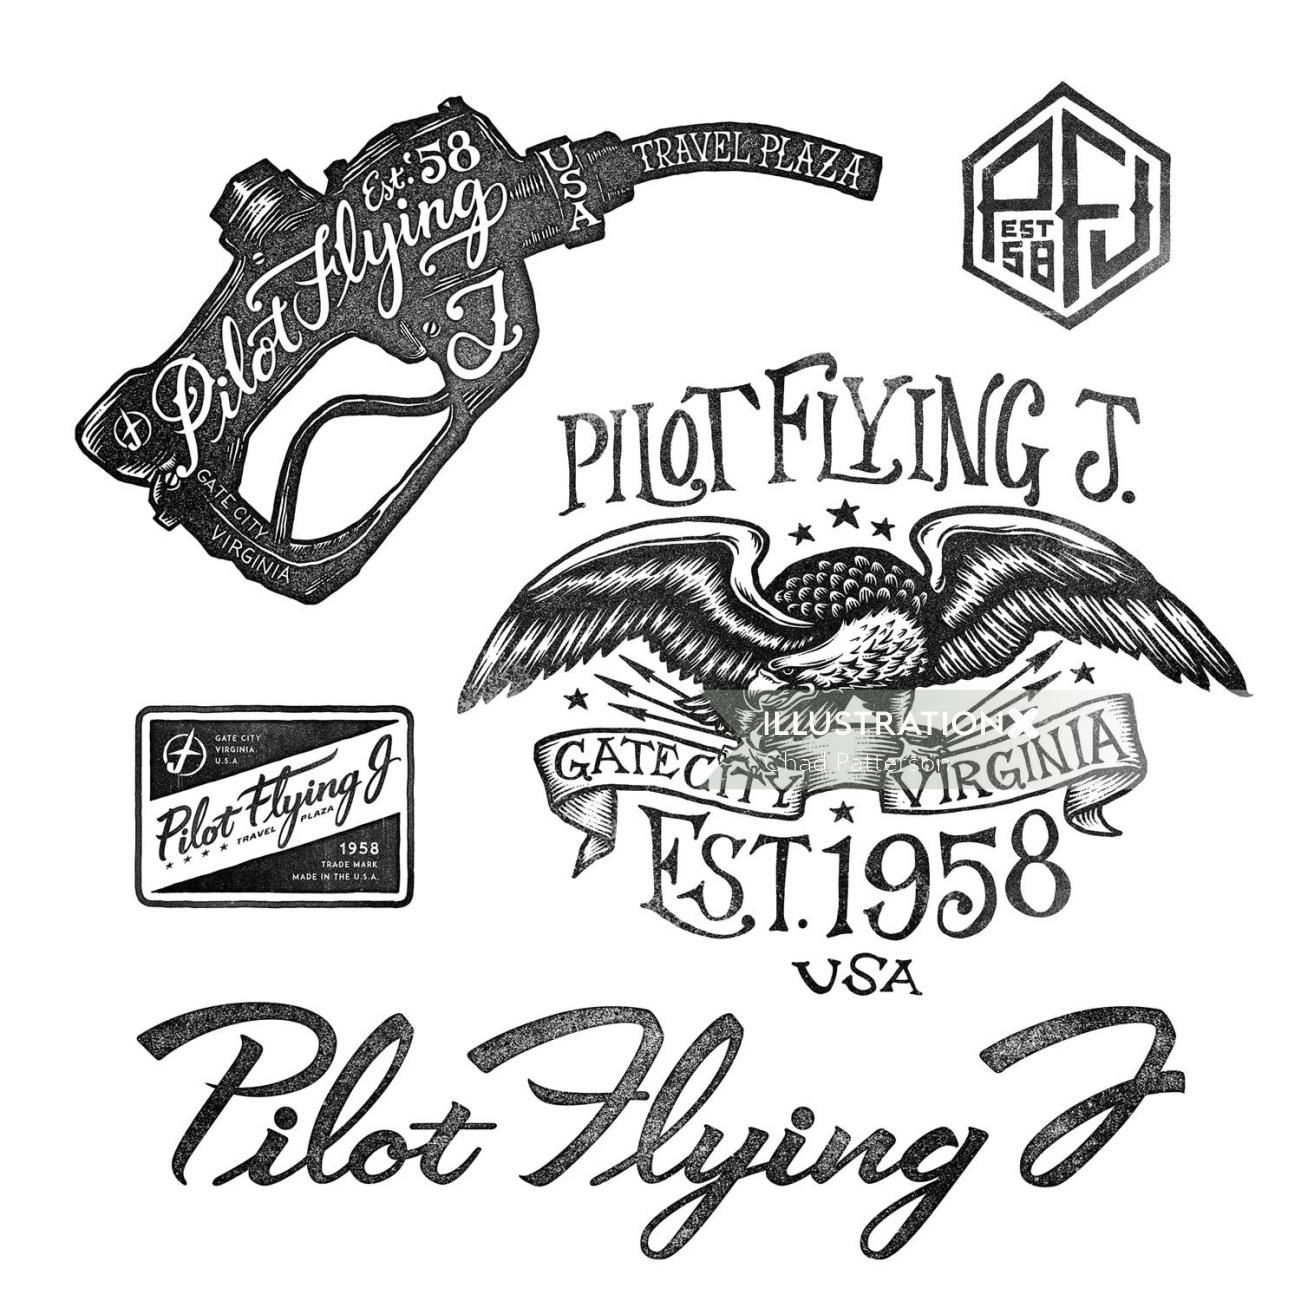 Pilot Flying  lettering Apparel designs